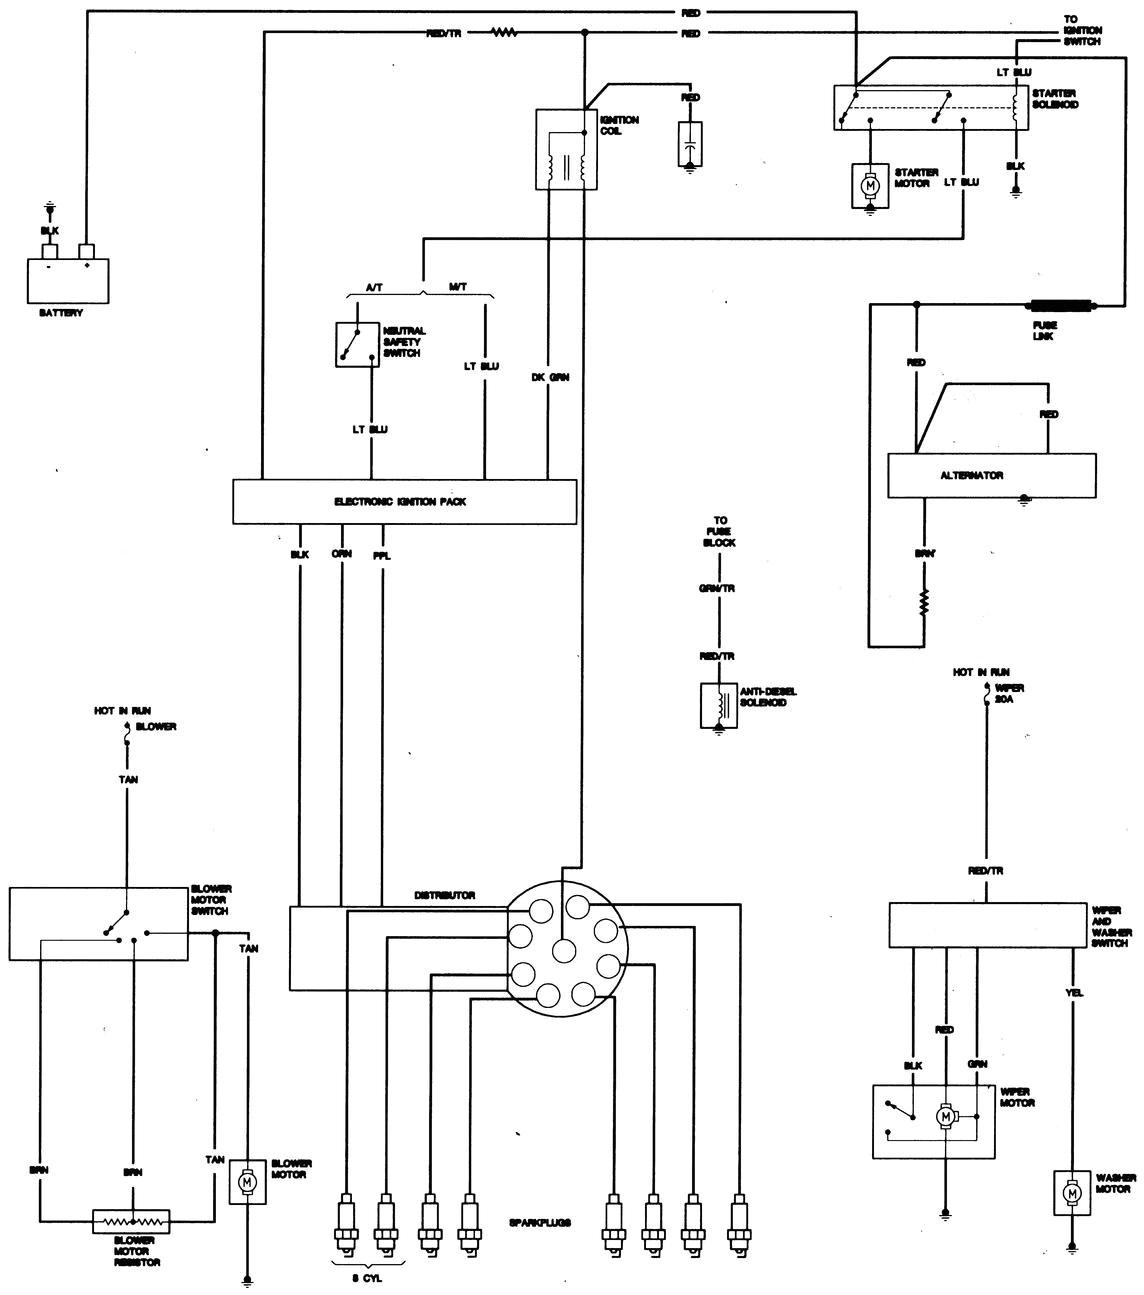 1978 Jeep Cj5 Wiring Diagram 78 Jeep Wiring Diagram Wiring Diagrams Konsult